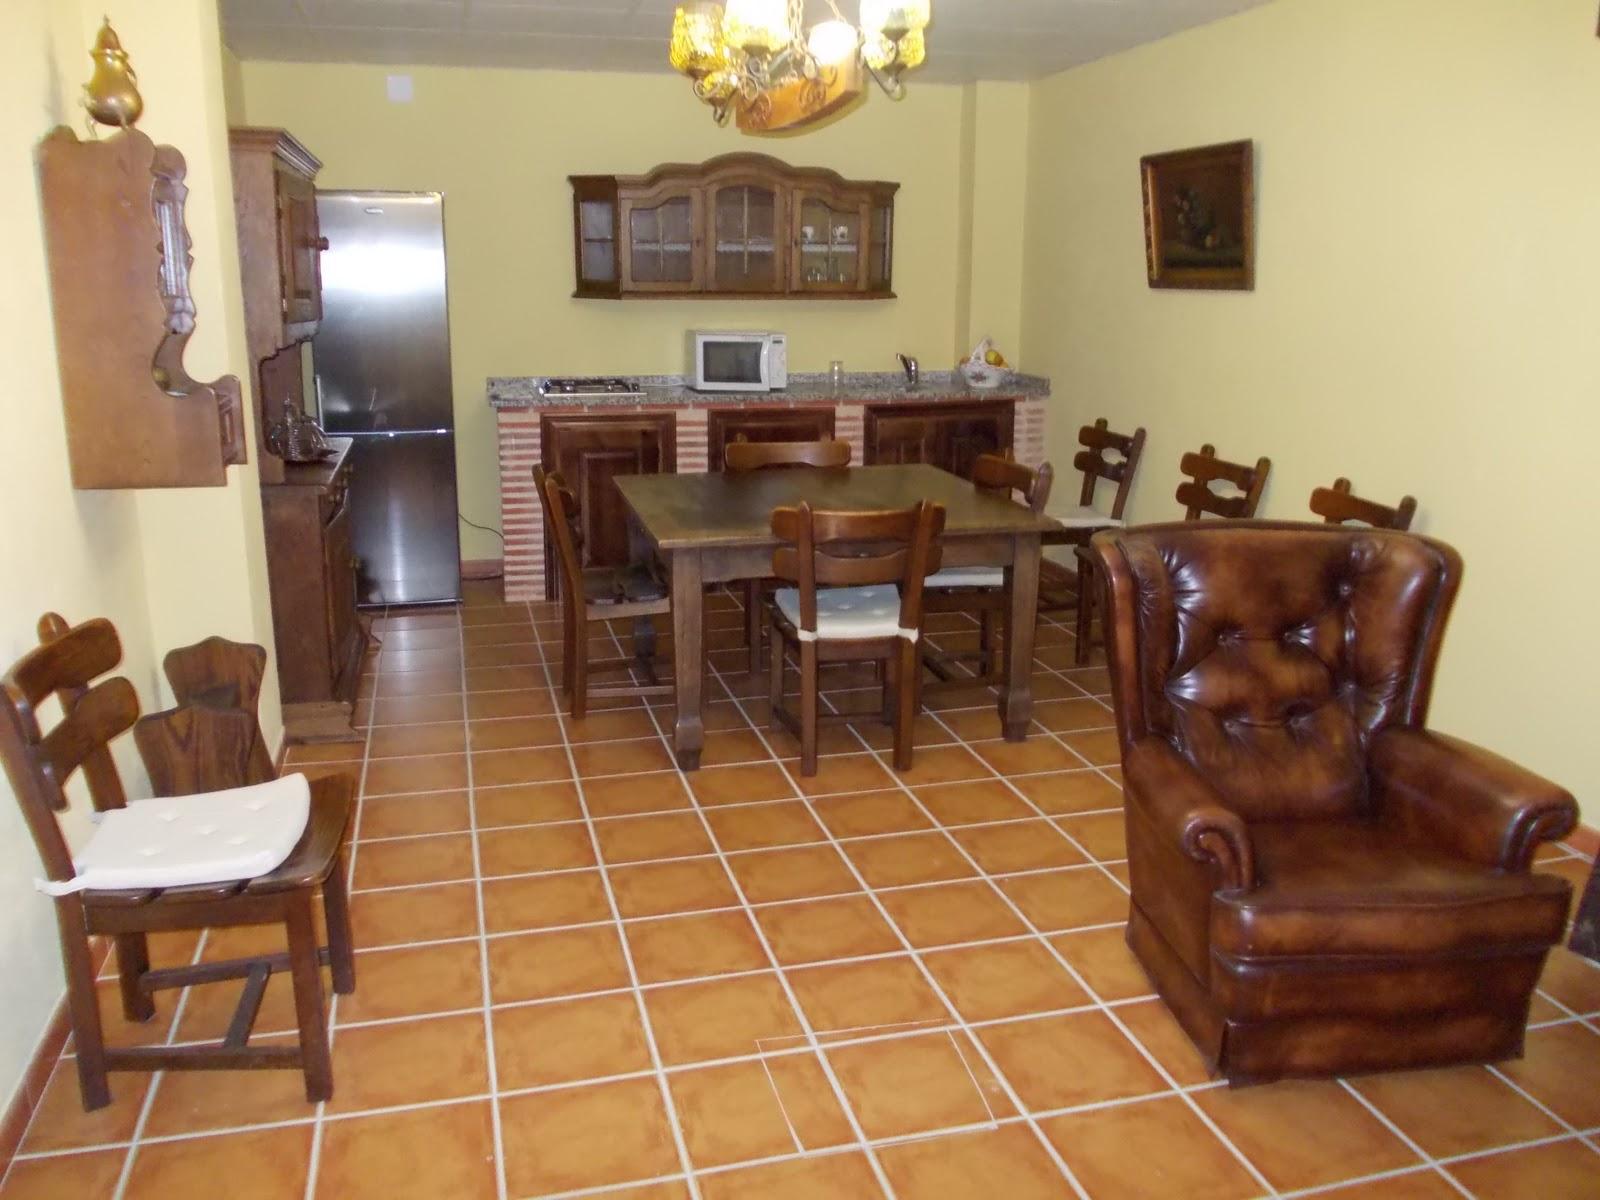 Decoraci n r stica muebles el juncal bodega particular - Bodegas rusticas decoracion ...